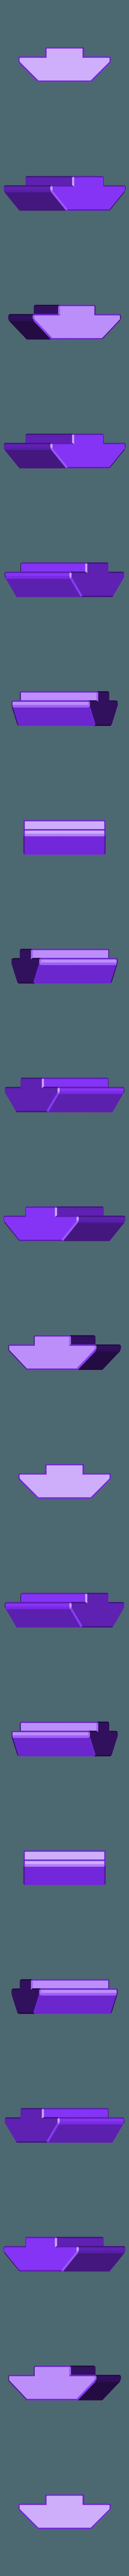 6mm_t-slot_nut.stl Download free STL file CNC 3018 Clamp set • 3D printing object, Sagittario